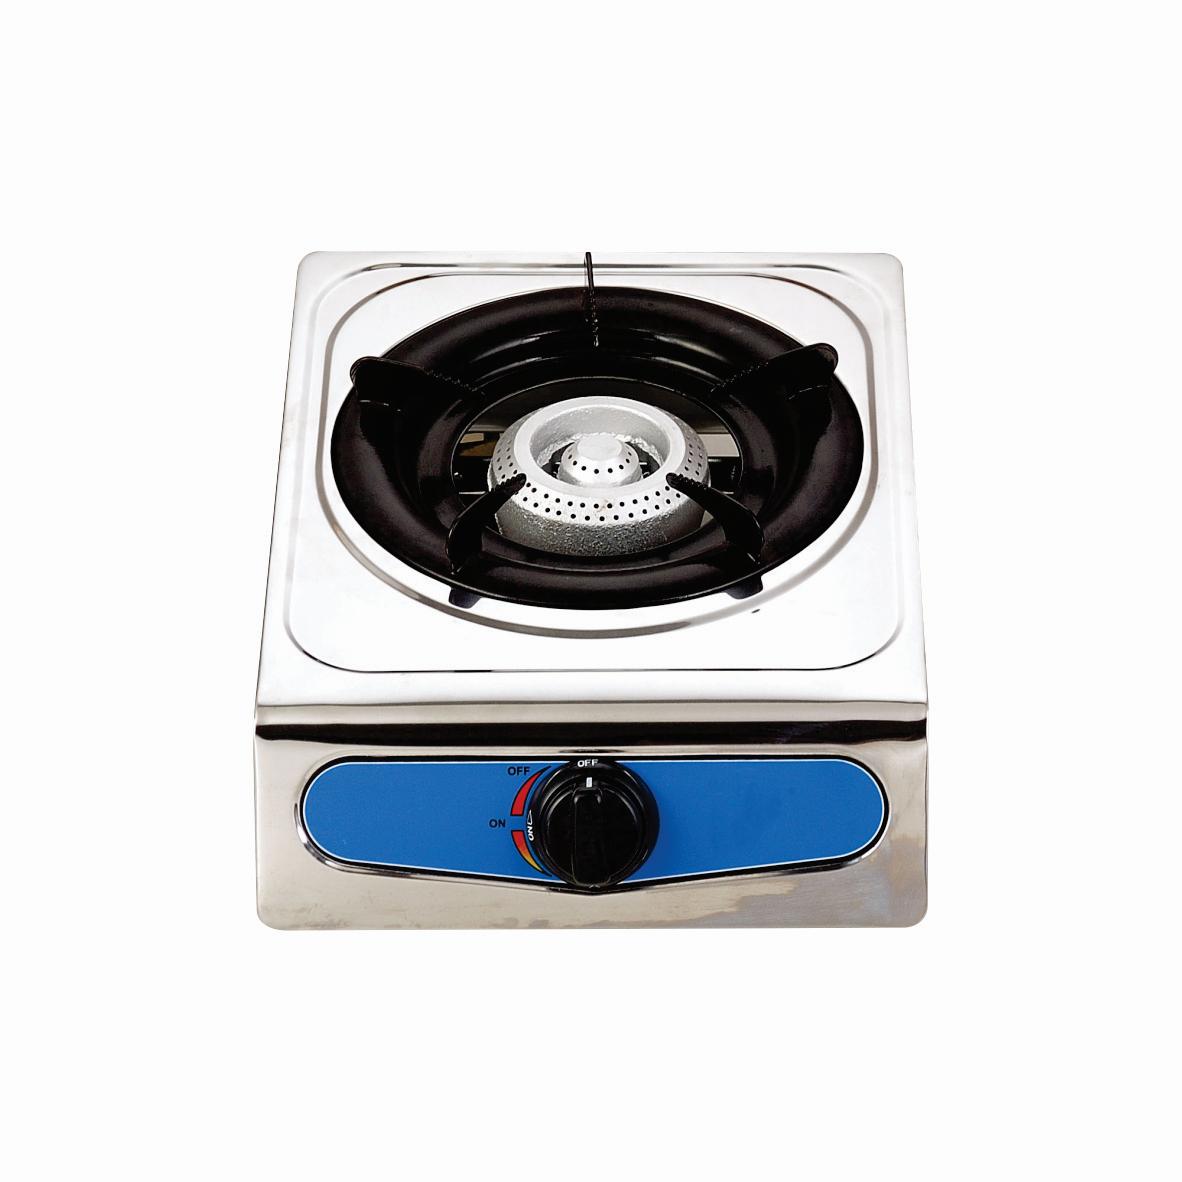 totai-single-burner-hotplate-sku-26001a---